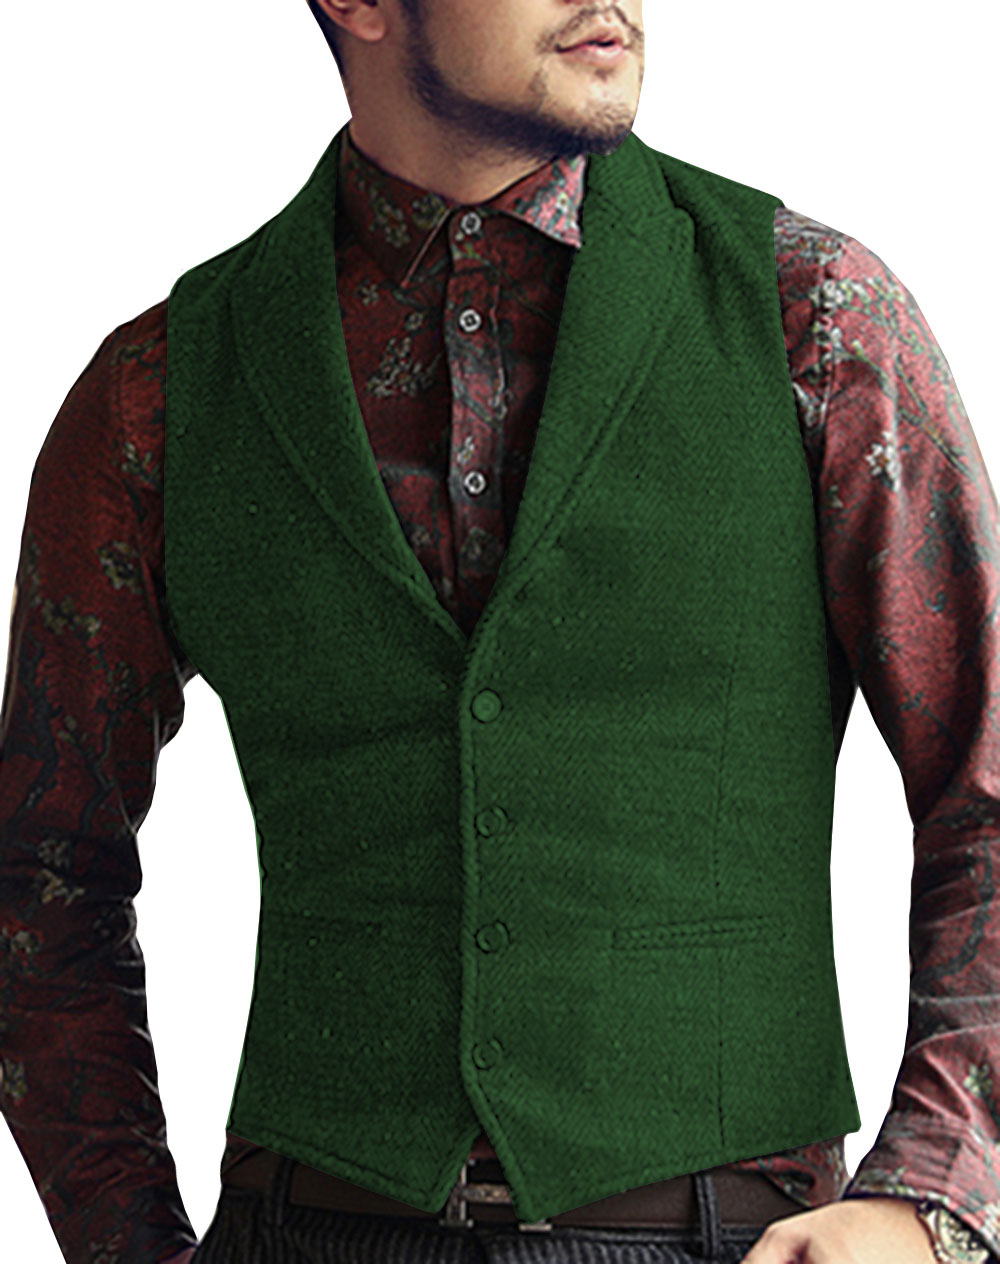 Mens-Suit-Vest-Lapel-V-Neck-Wool-Herringbone-Casual-Formal-Business-Vest-Waistcoat-Groomman-For-Wedding (1)